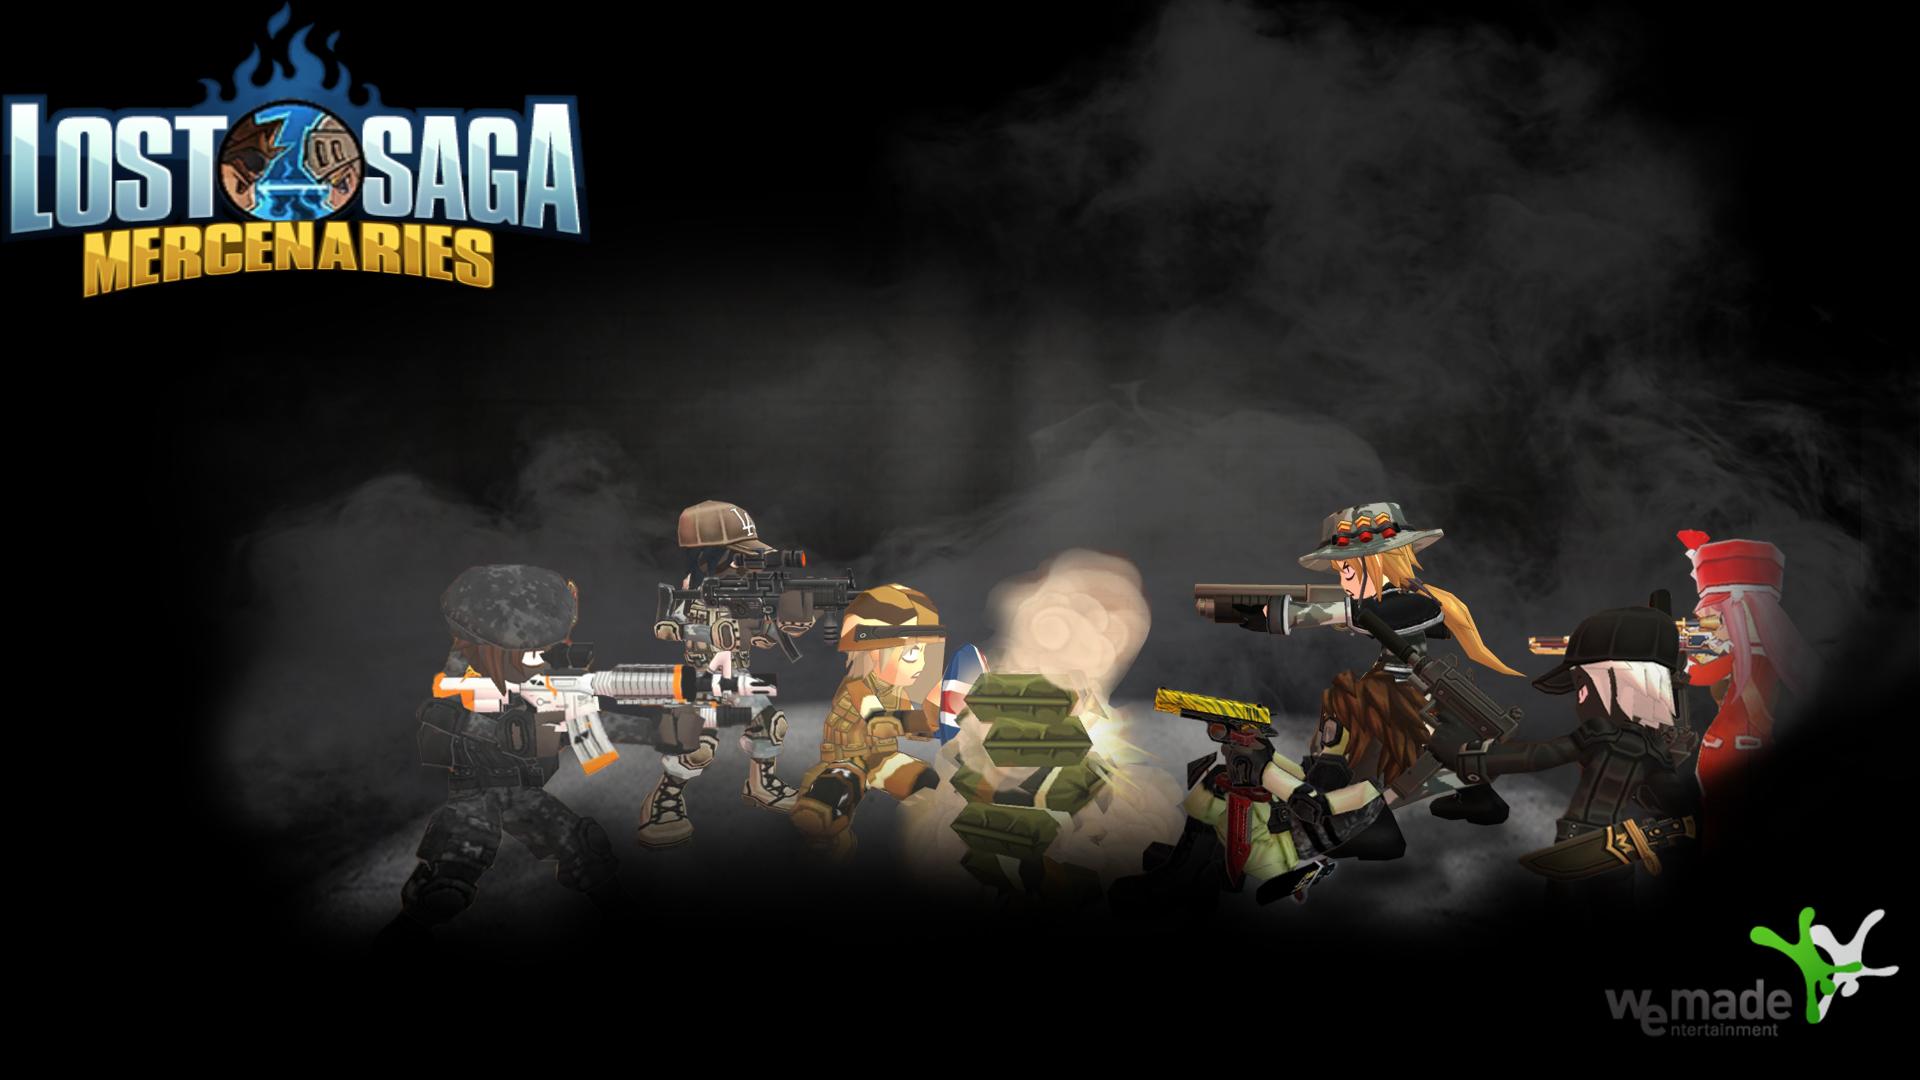 Lostsaga Mercenaries